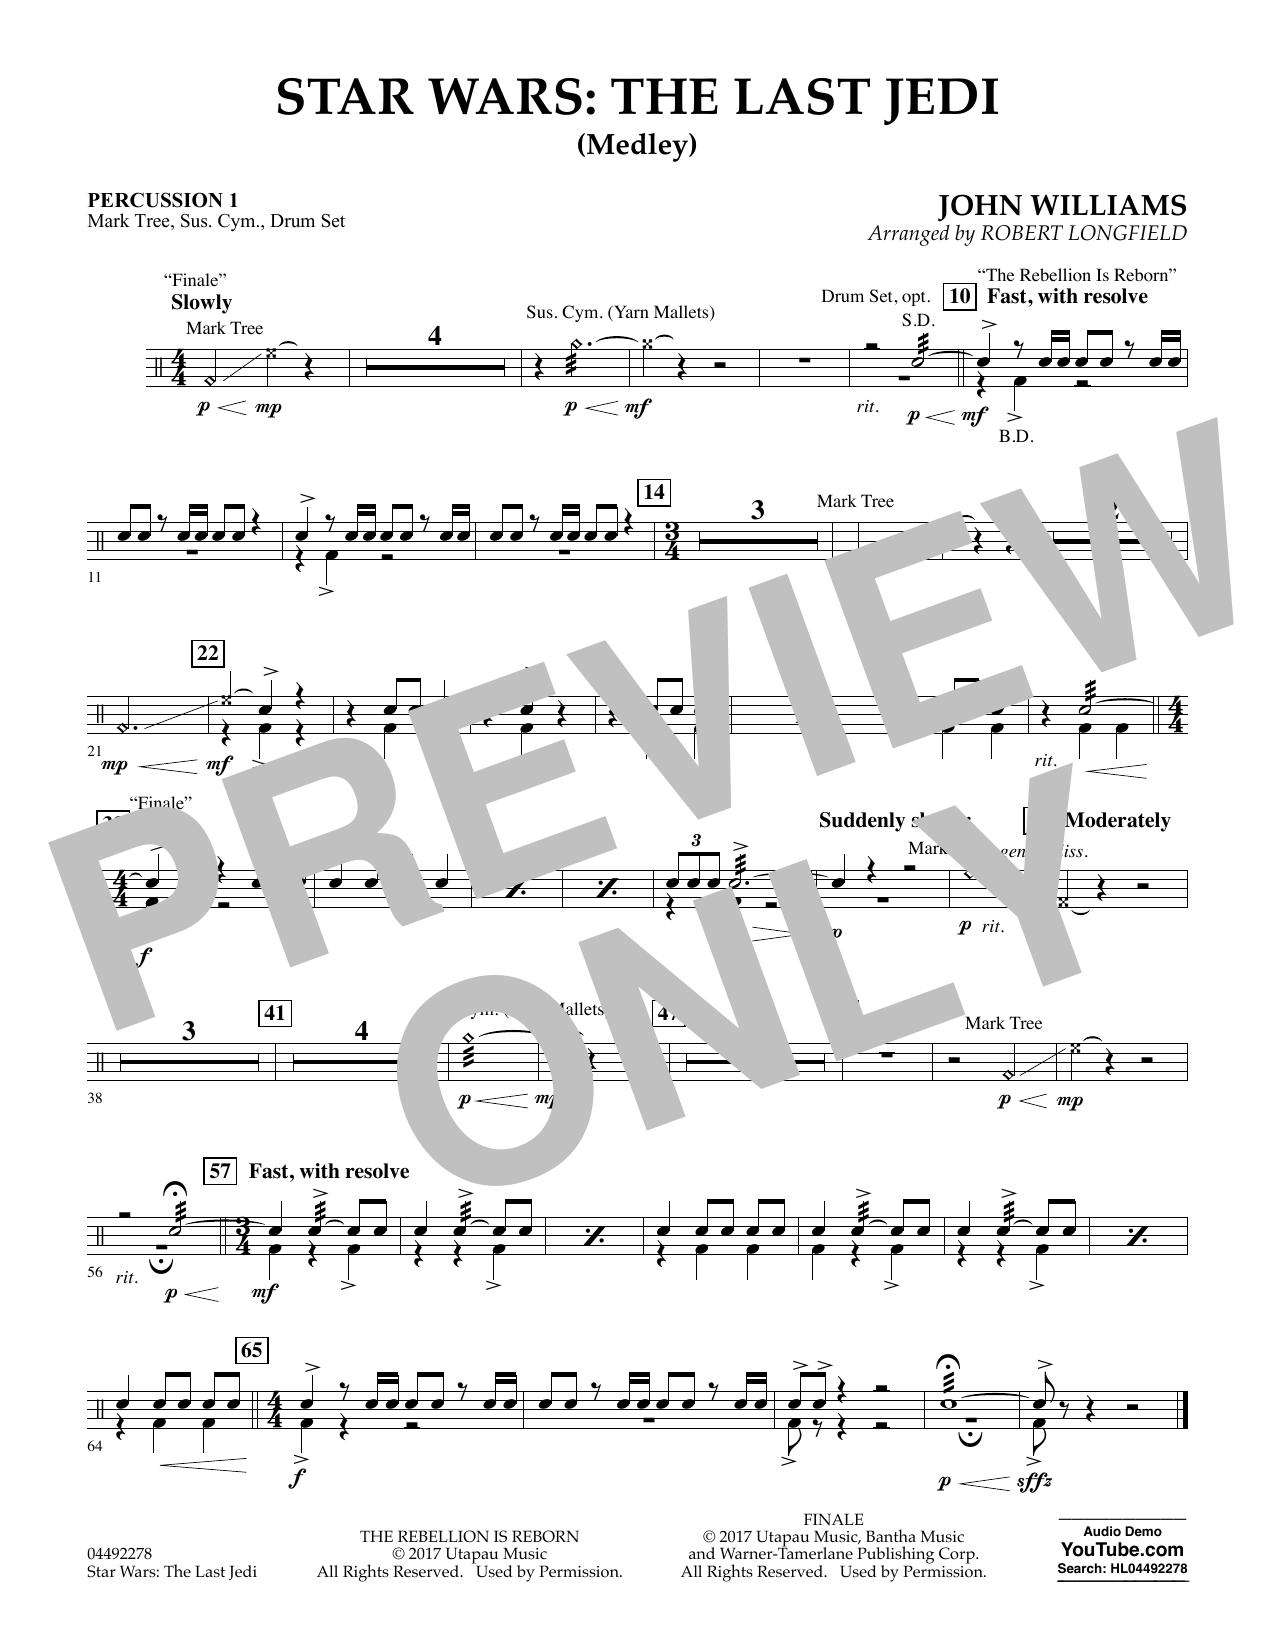 Star Wars: The Last Jedi (Medley) (arr. Robert Longfield) - Percussion 1 (Orchestra)